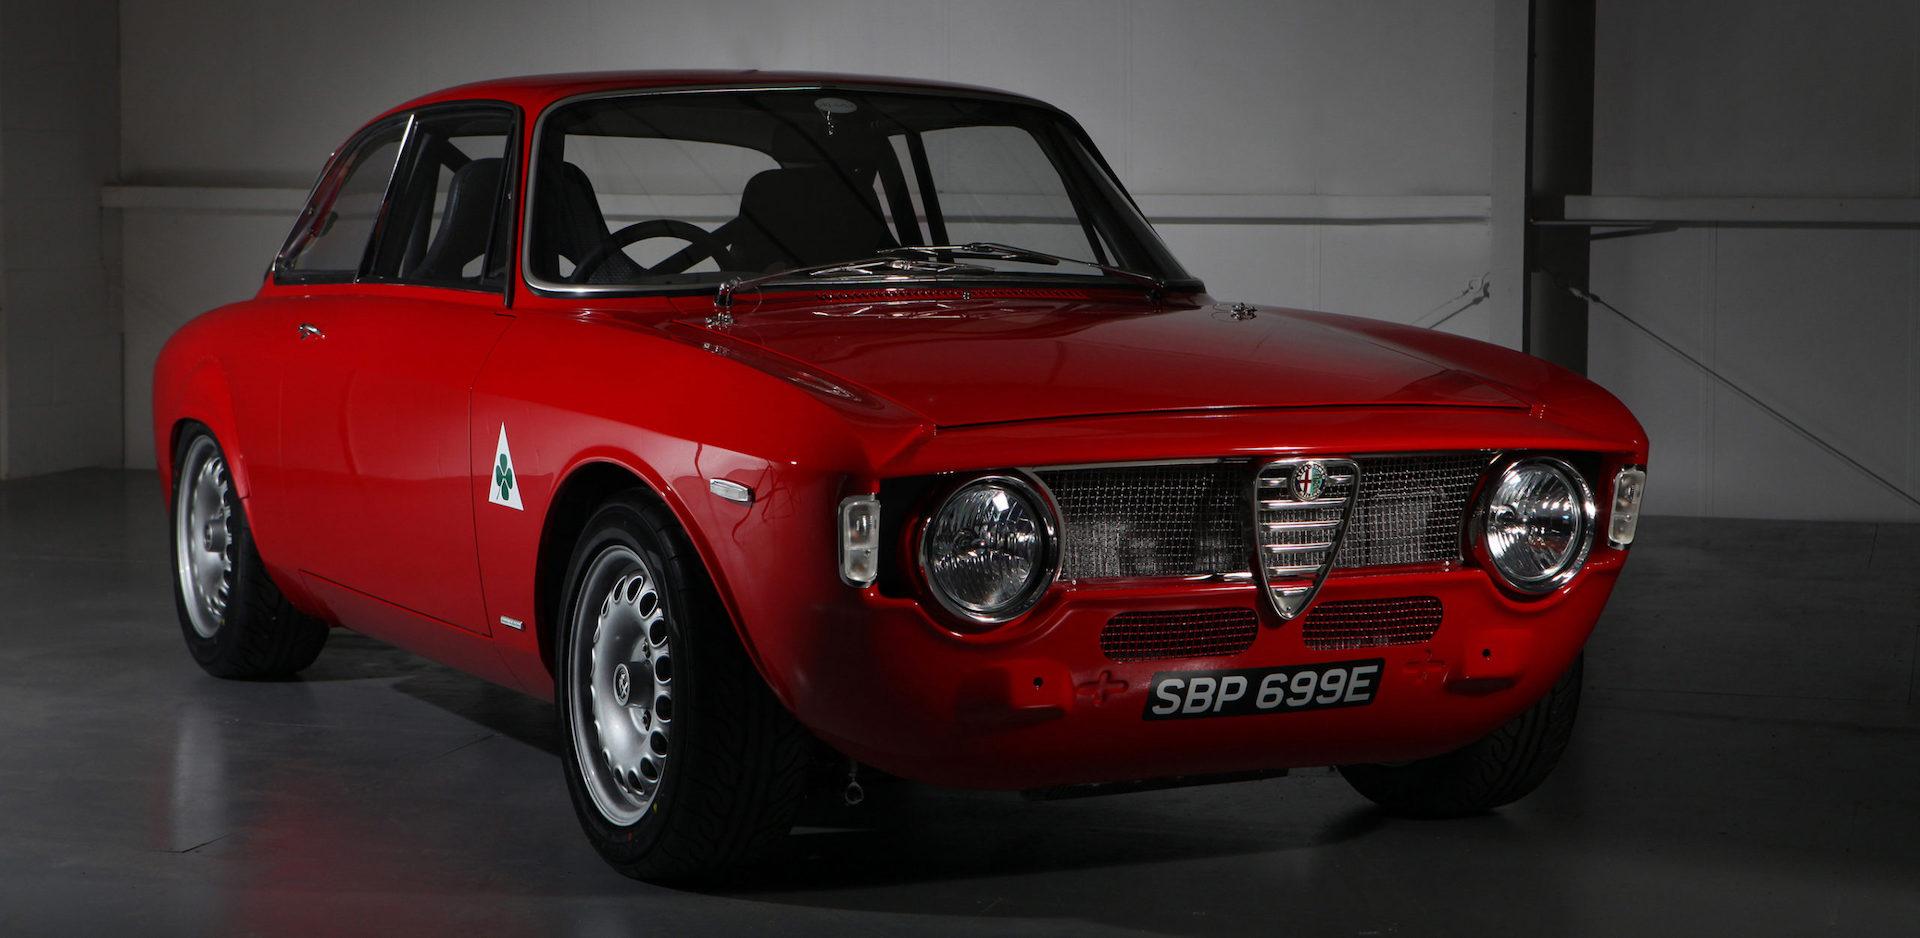 Alfa Romeo Giulia 105 GTA Alfaholics GTA-R